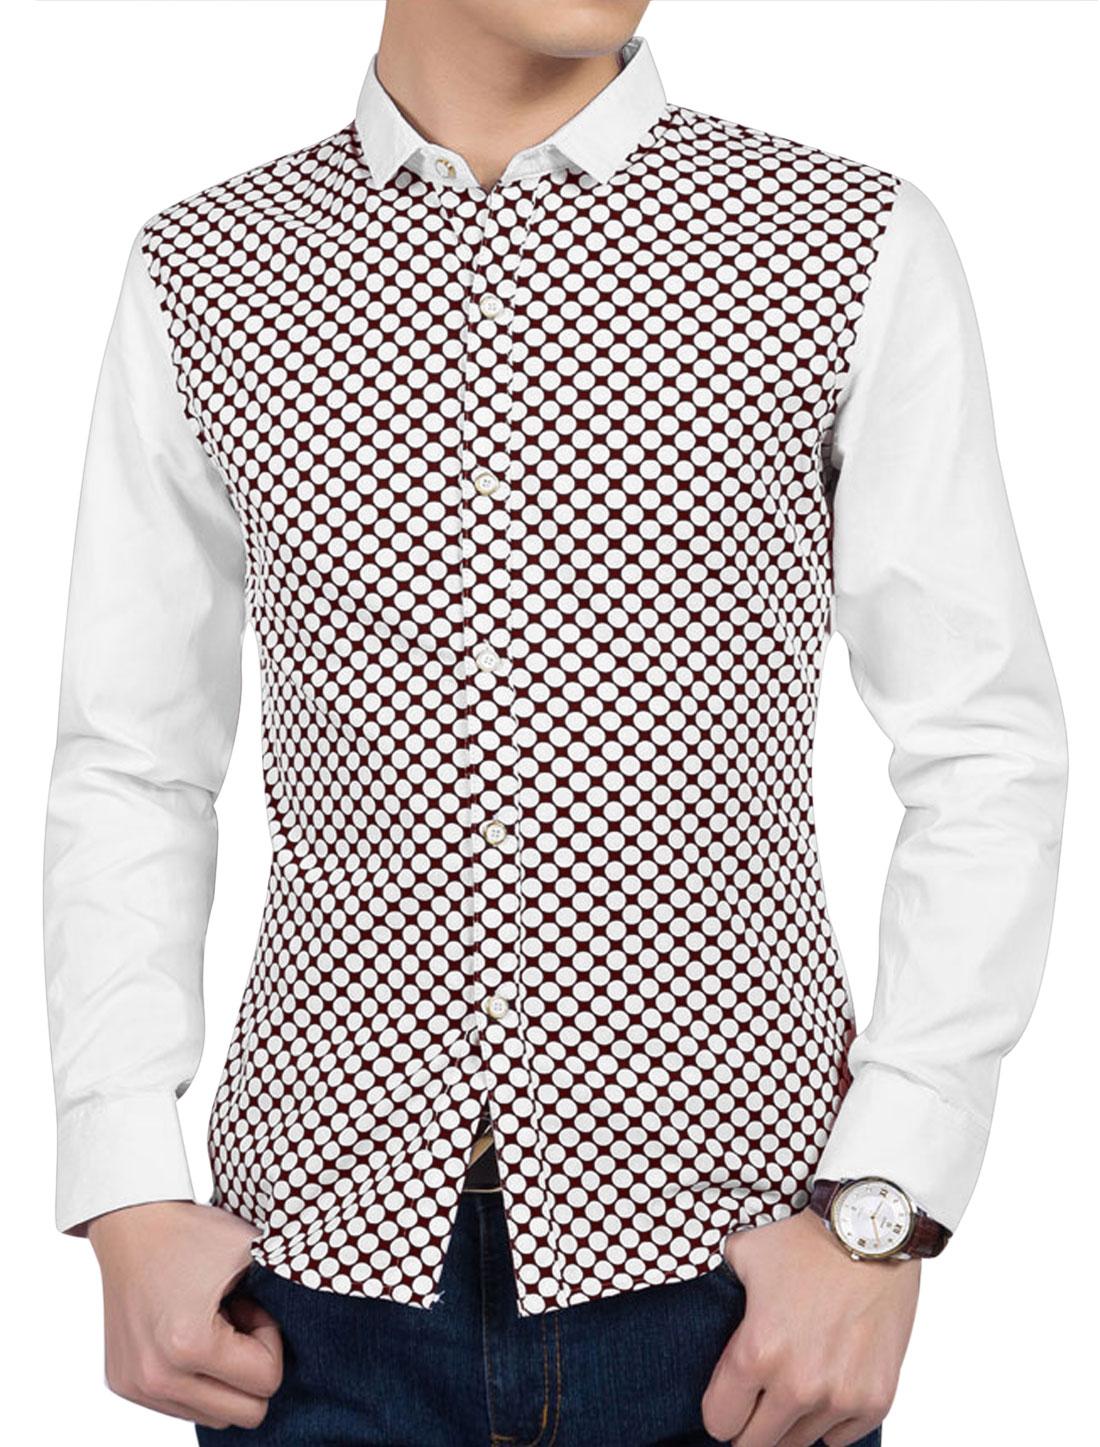 Man Polka Dots Prints Turn Down Collar Long Sleeves Casual Shirts Burgundy White M